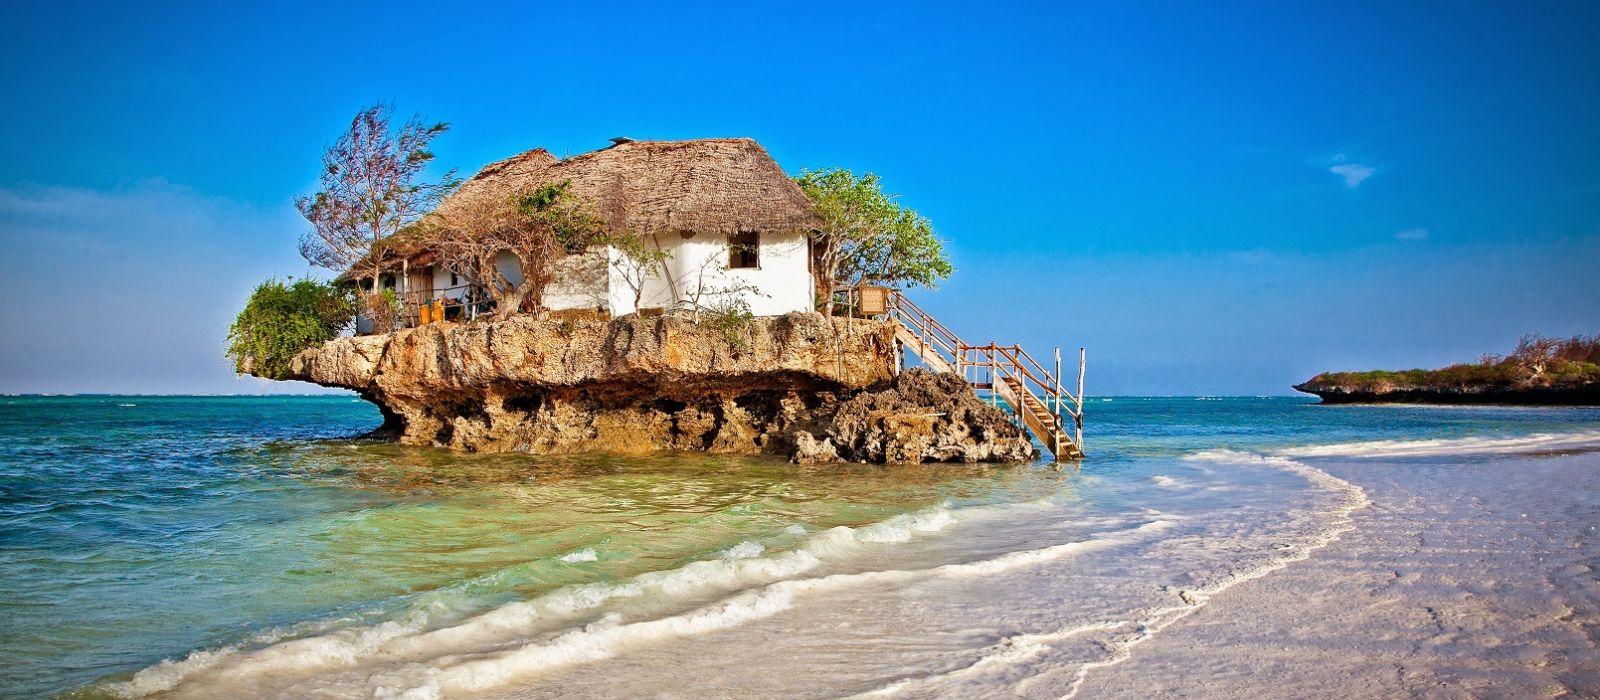 Rock Restaurant over the sea in Zanzibar, Tanzania, Africa, shutterstock_180192350